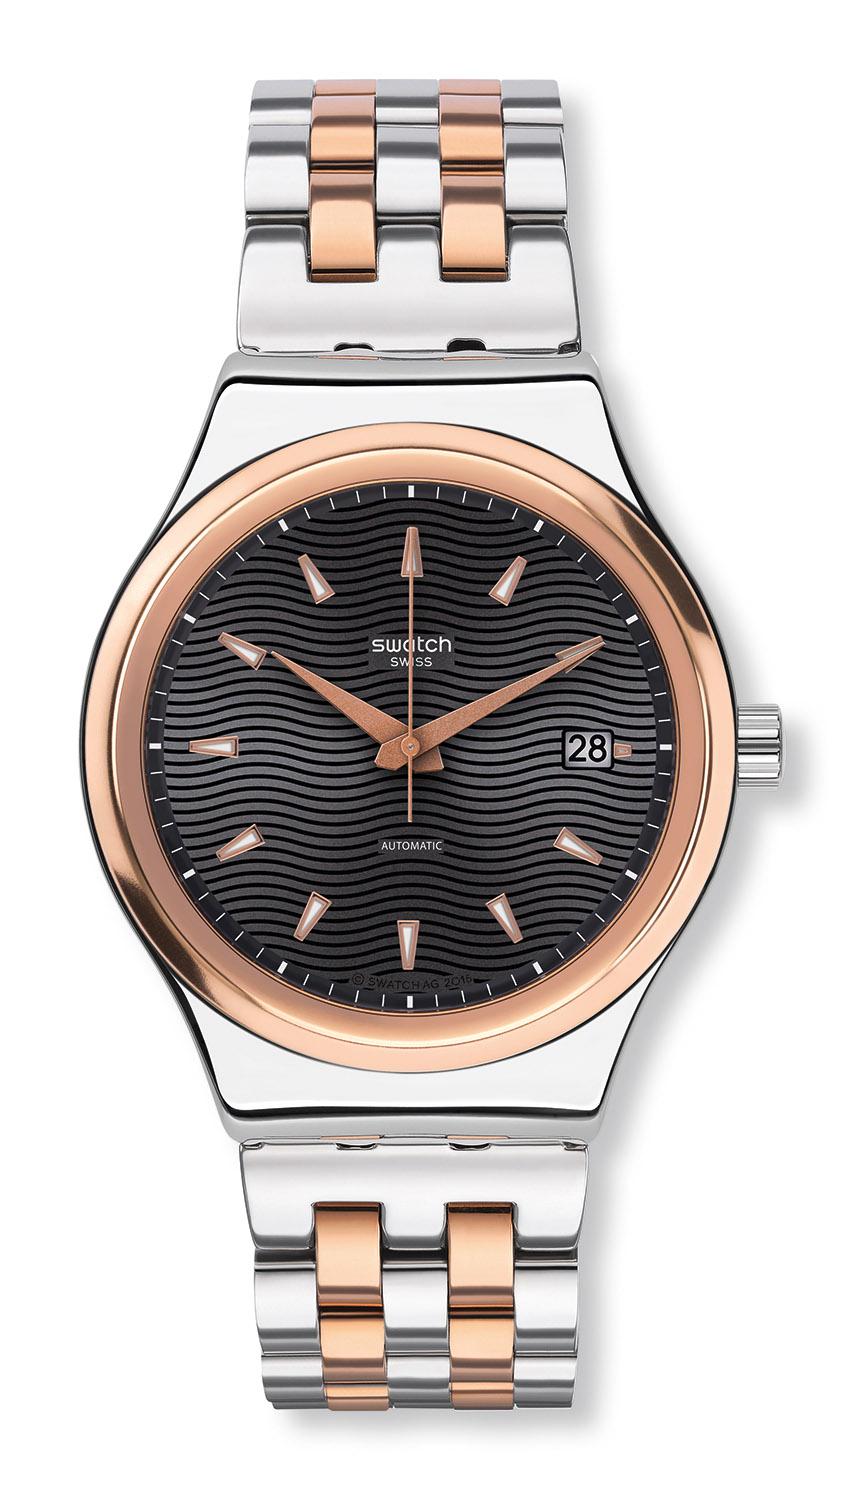 Swatch-Sistem-51-rony-Automatics-Stainless-Steel-4.jpg